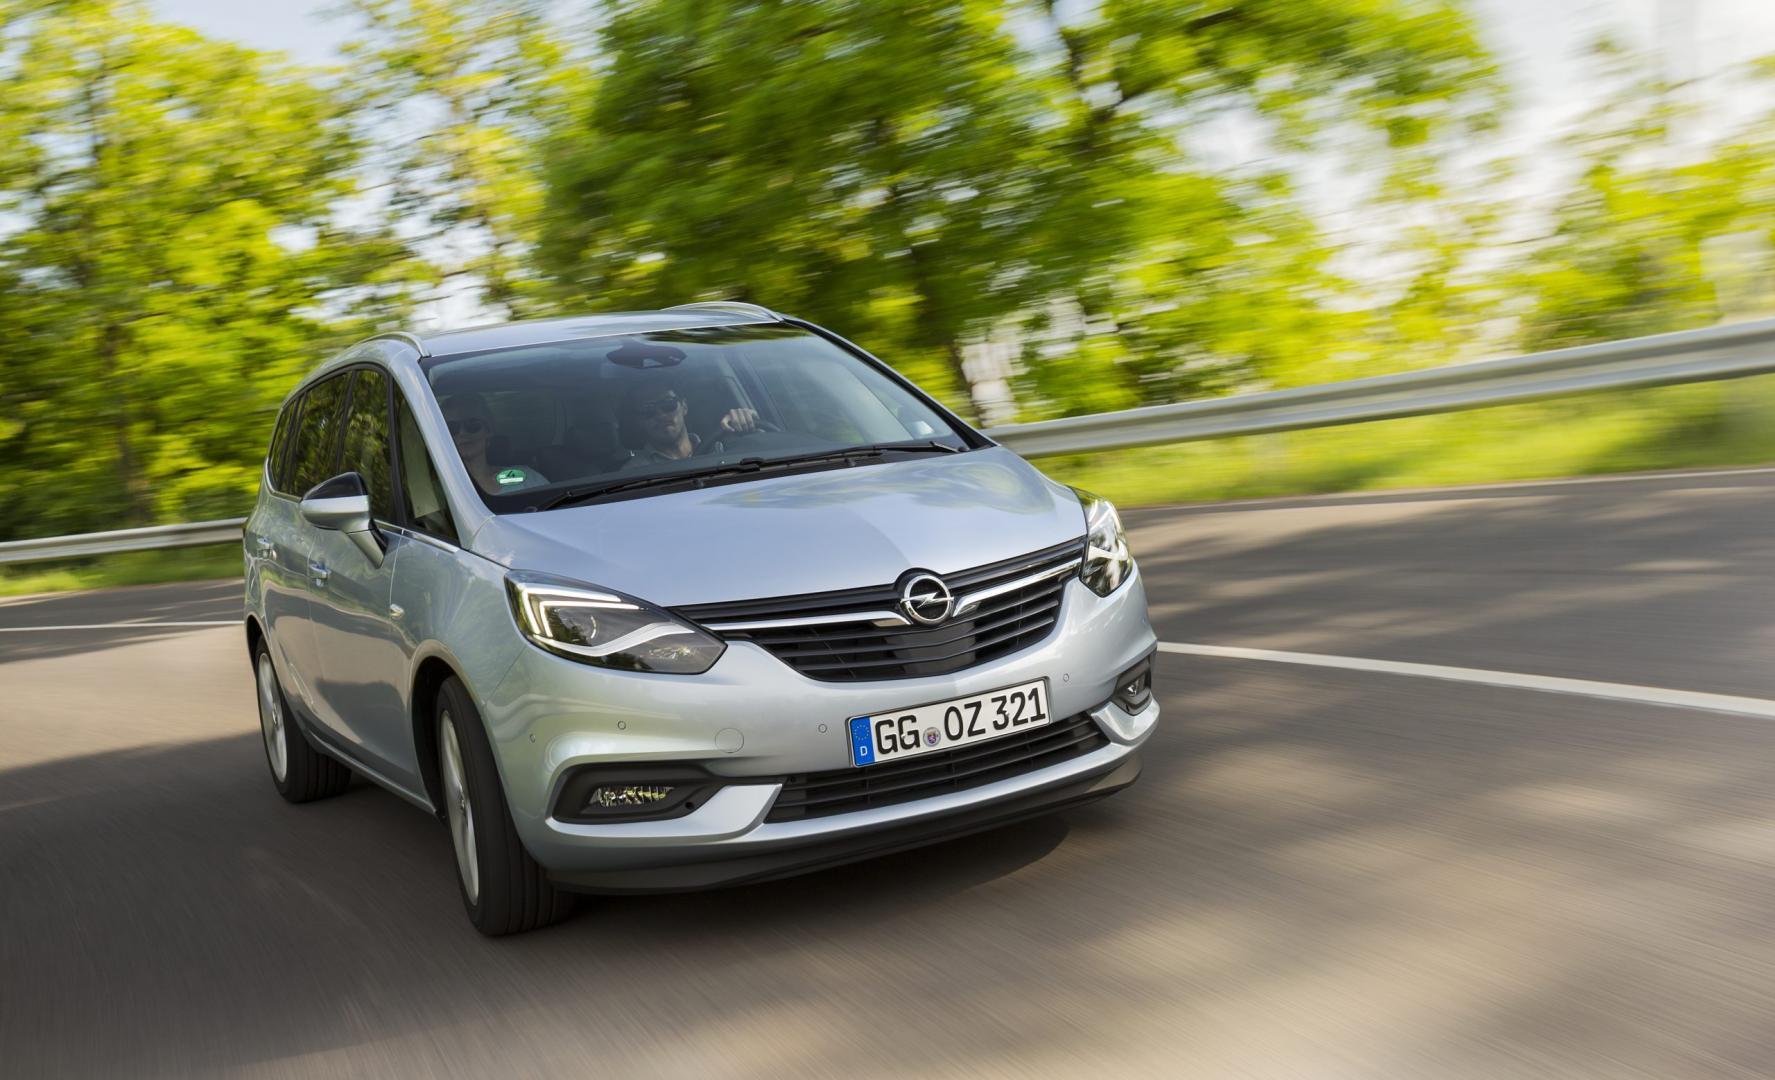 Opel Zafira 2.0 CDT